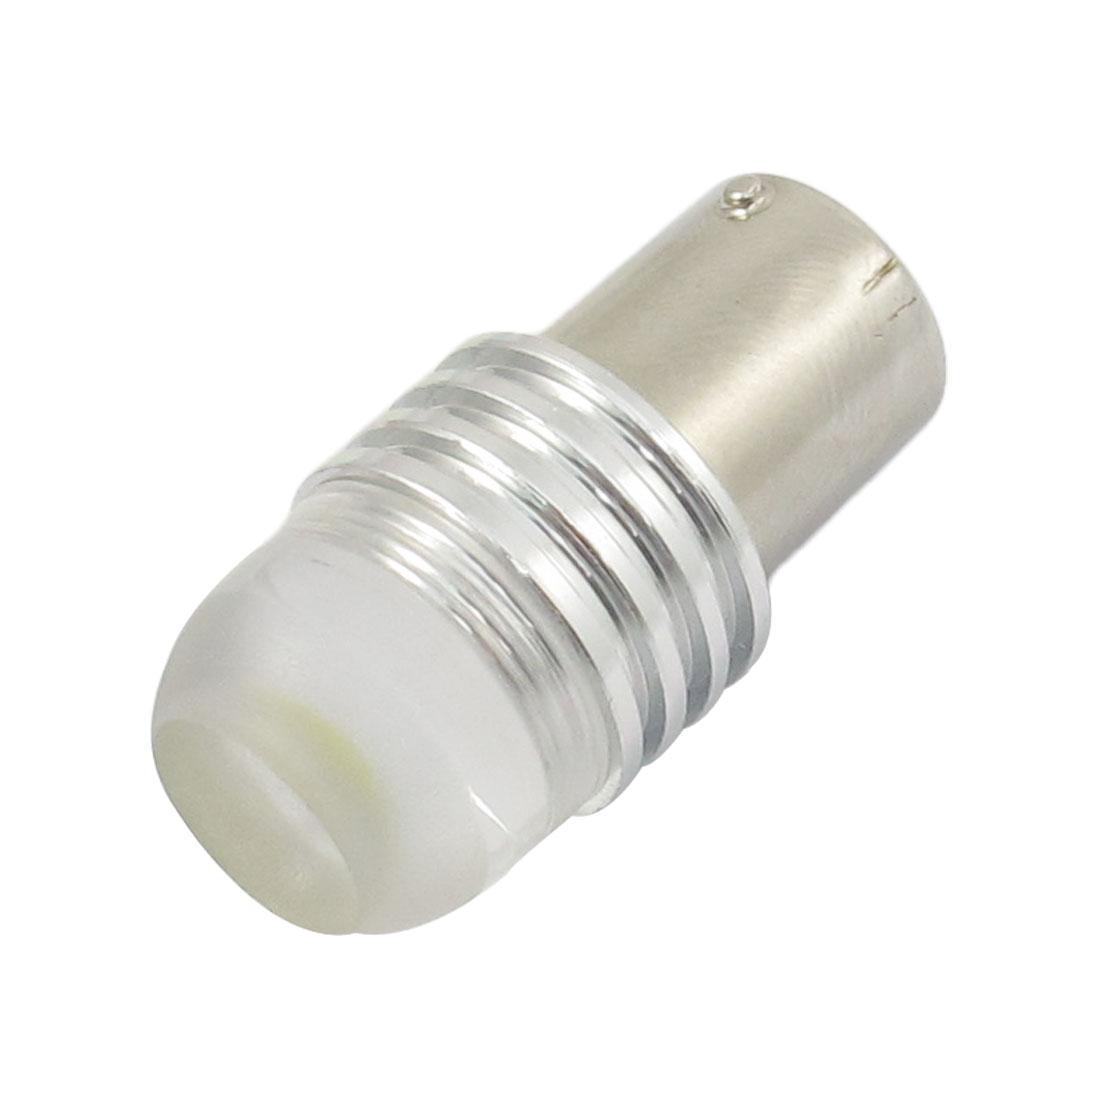 Fish Eye Head BA15S 3W White Wedge LED Lamp Bulb Reverse Light for Car Auto